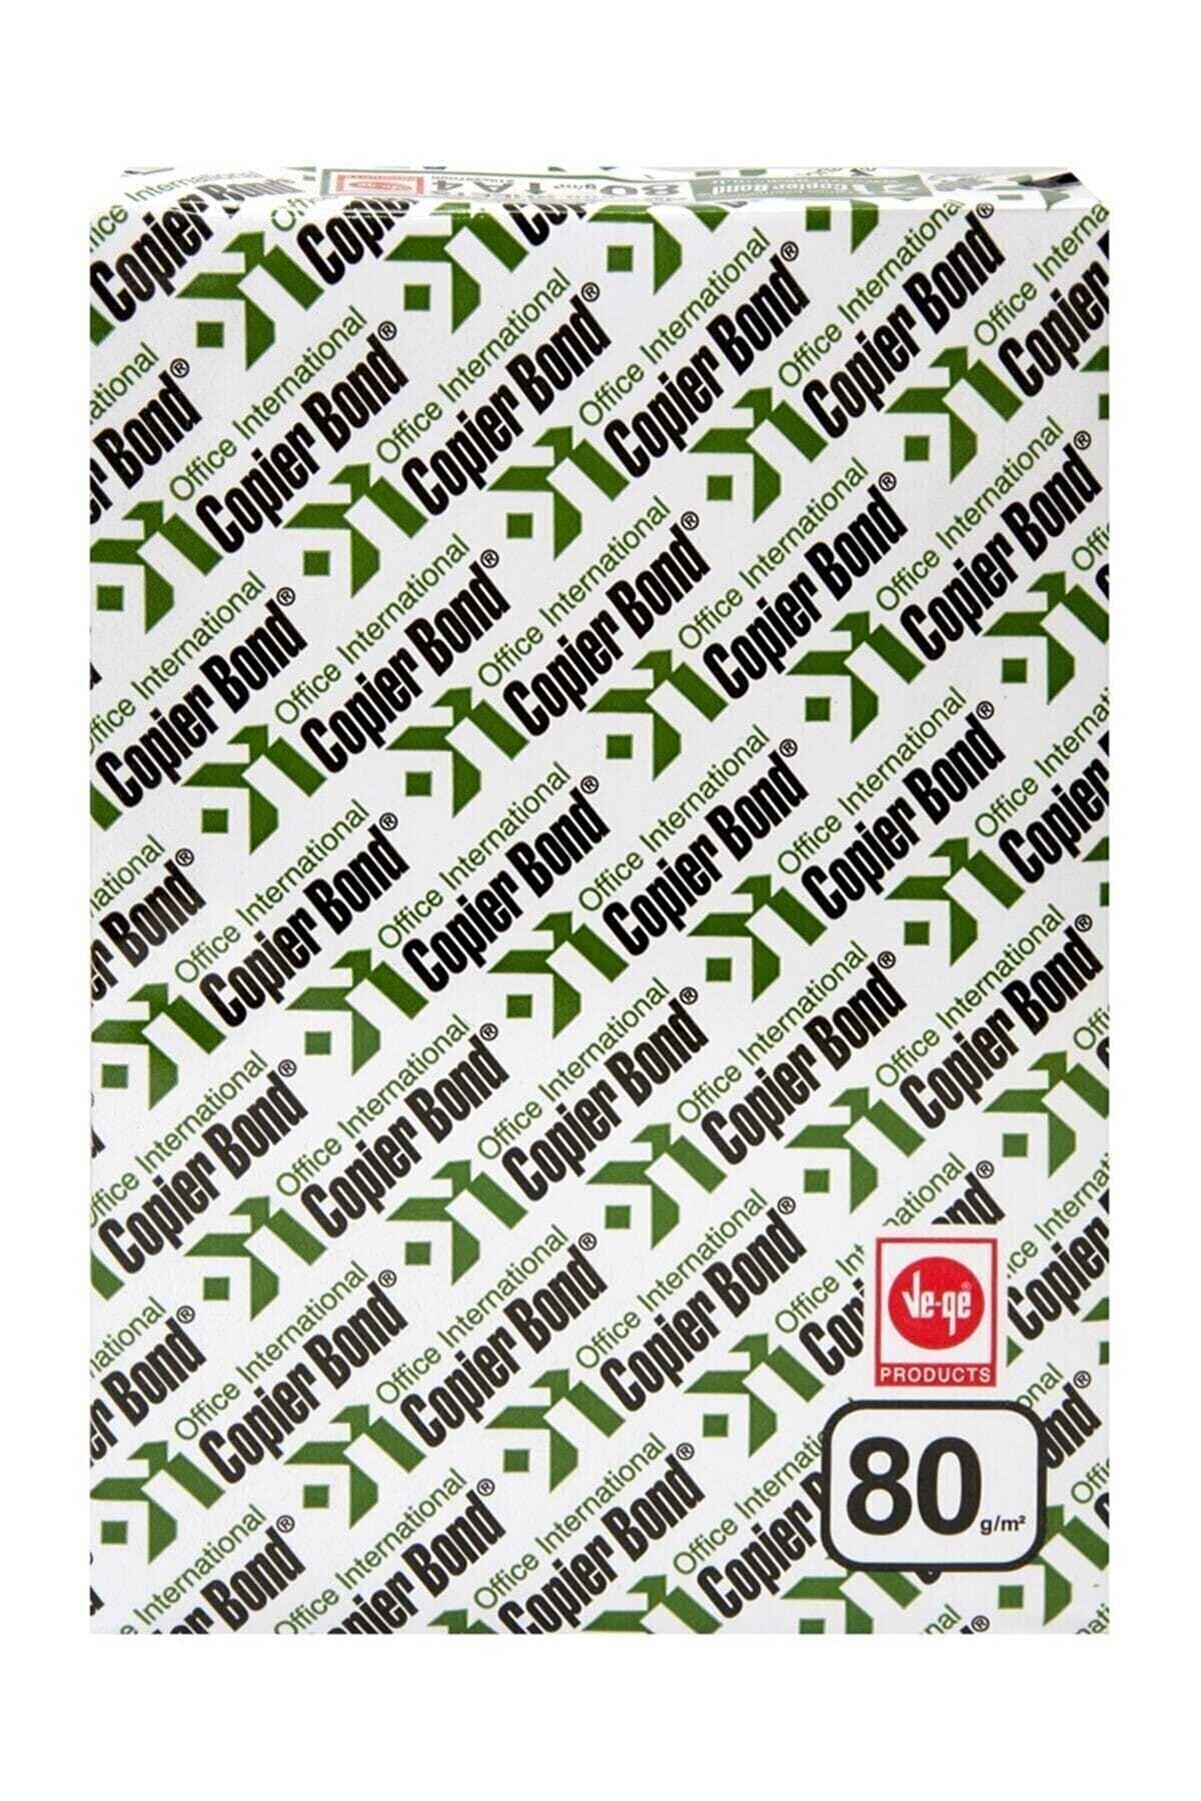 Copierbond Fotokopi Kağıdı A4 500 Yaprak 80 gr